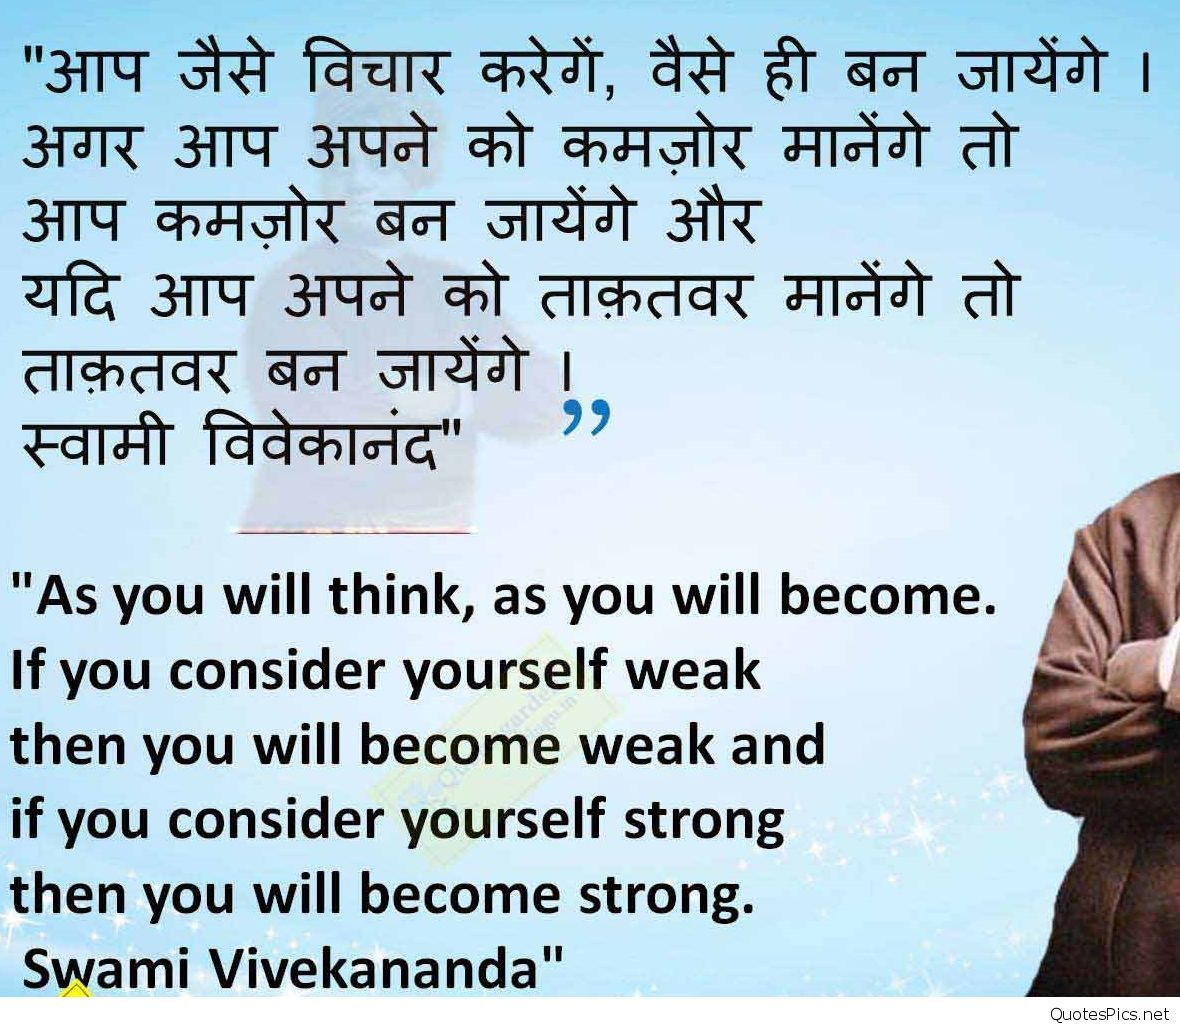 Best Of Swami Vivekananda Quotations Swami Viveknanada Good